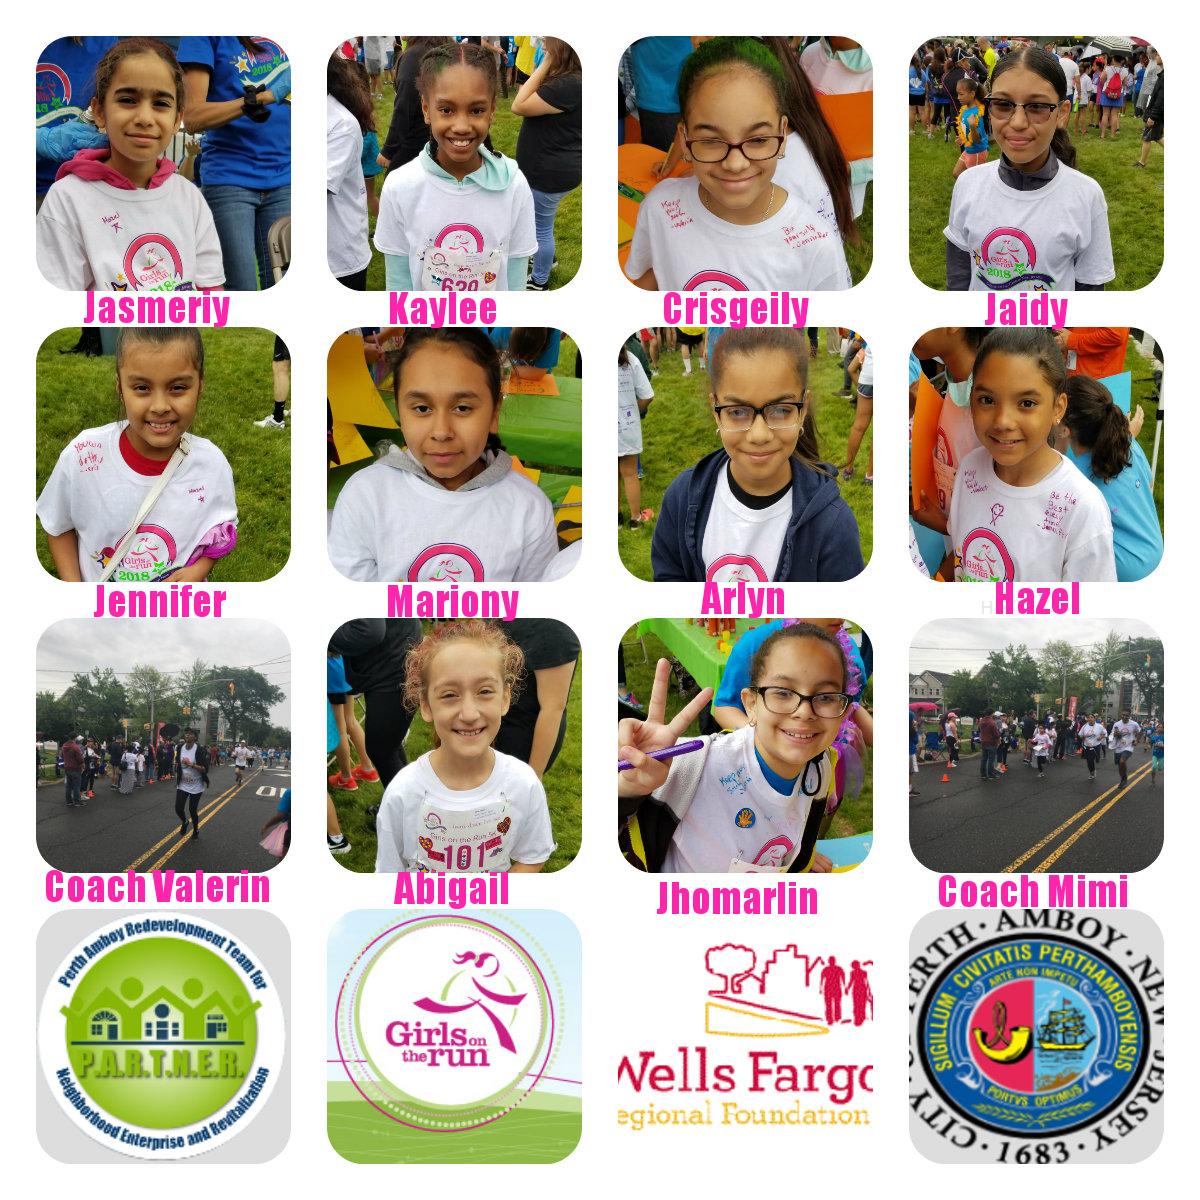 Girls On the Run June 2018